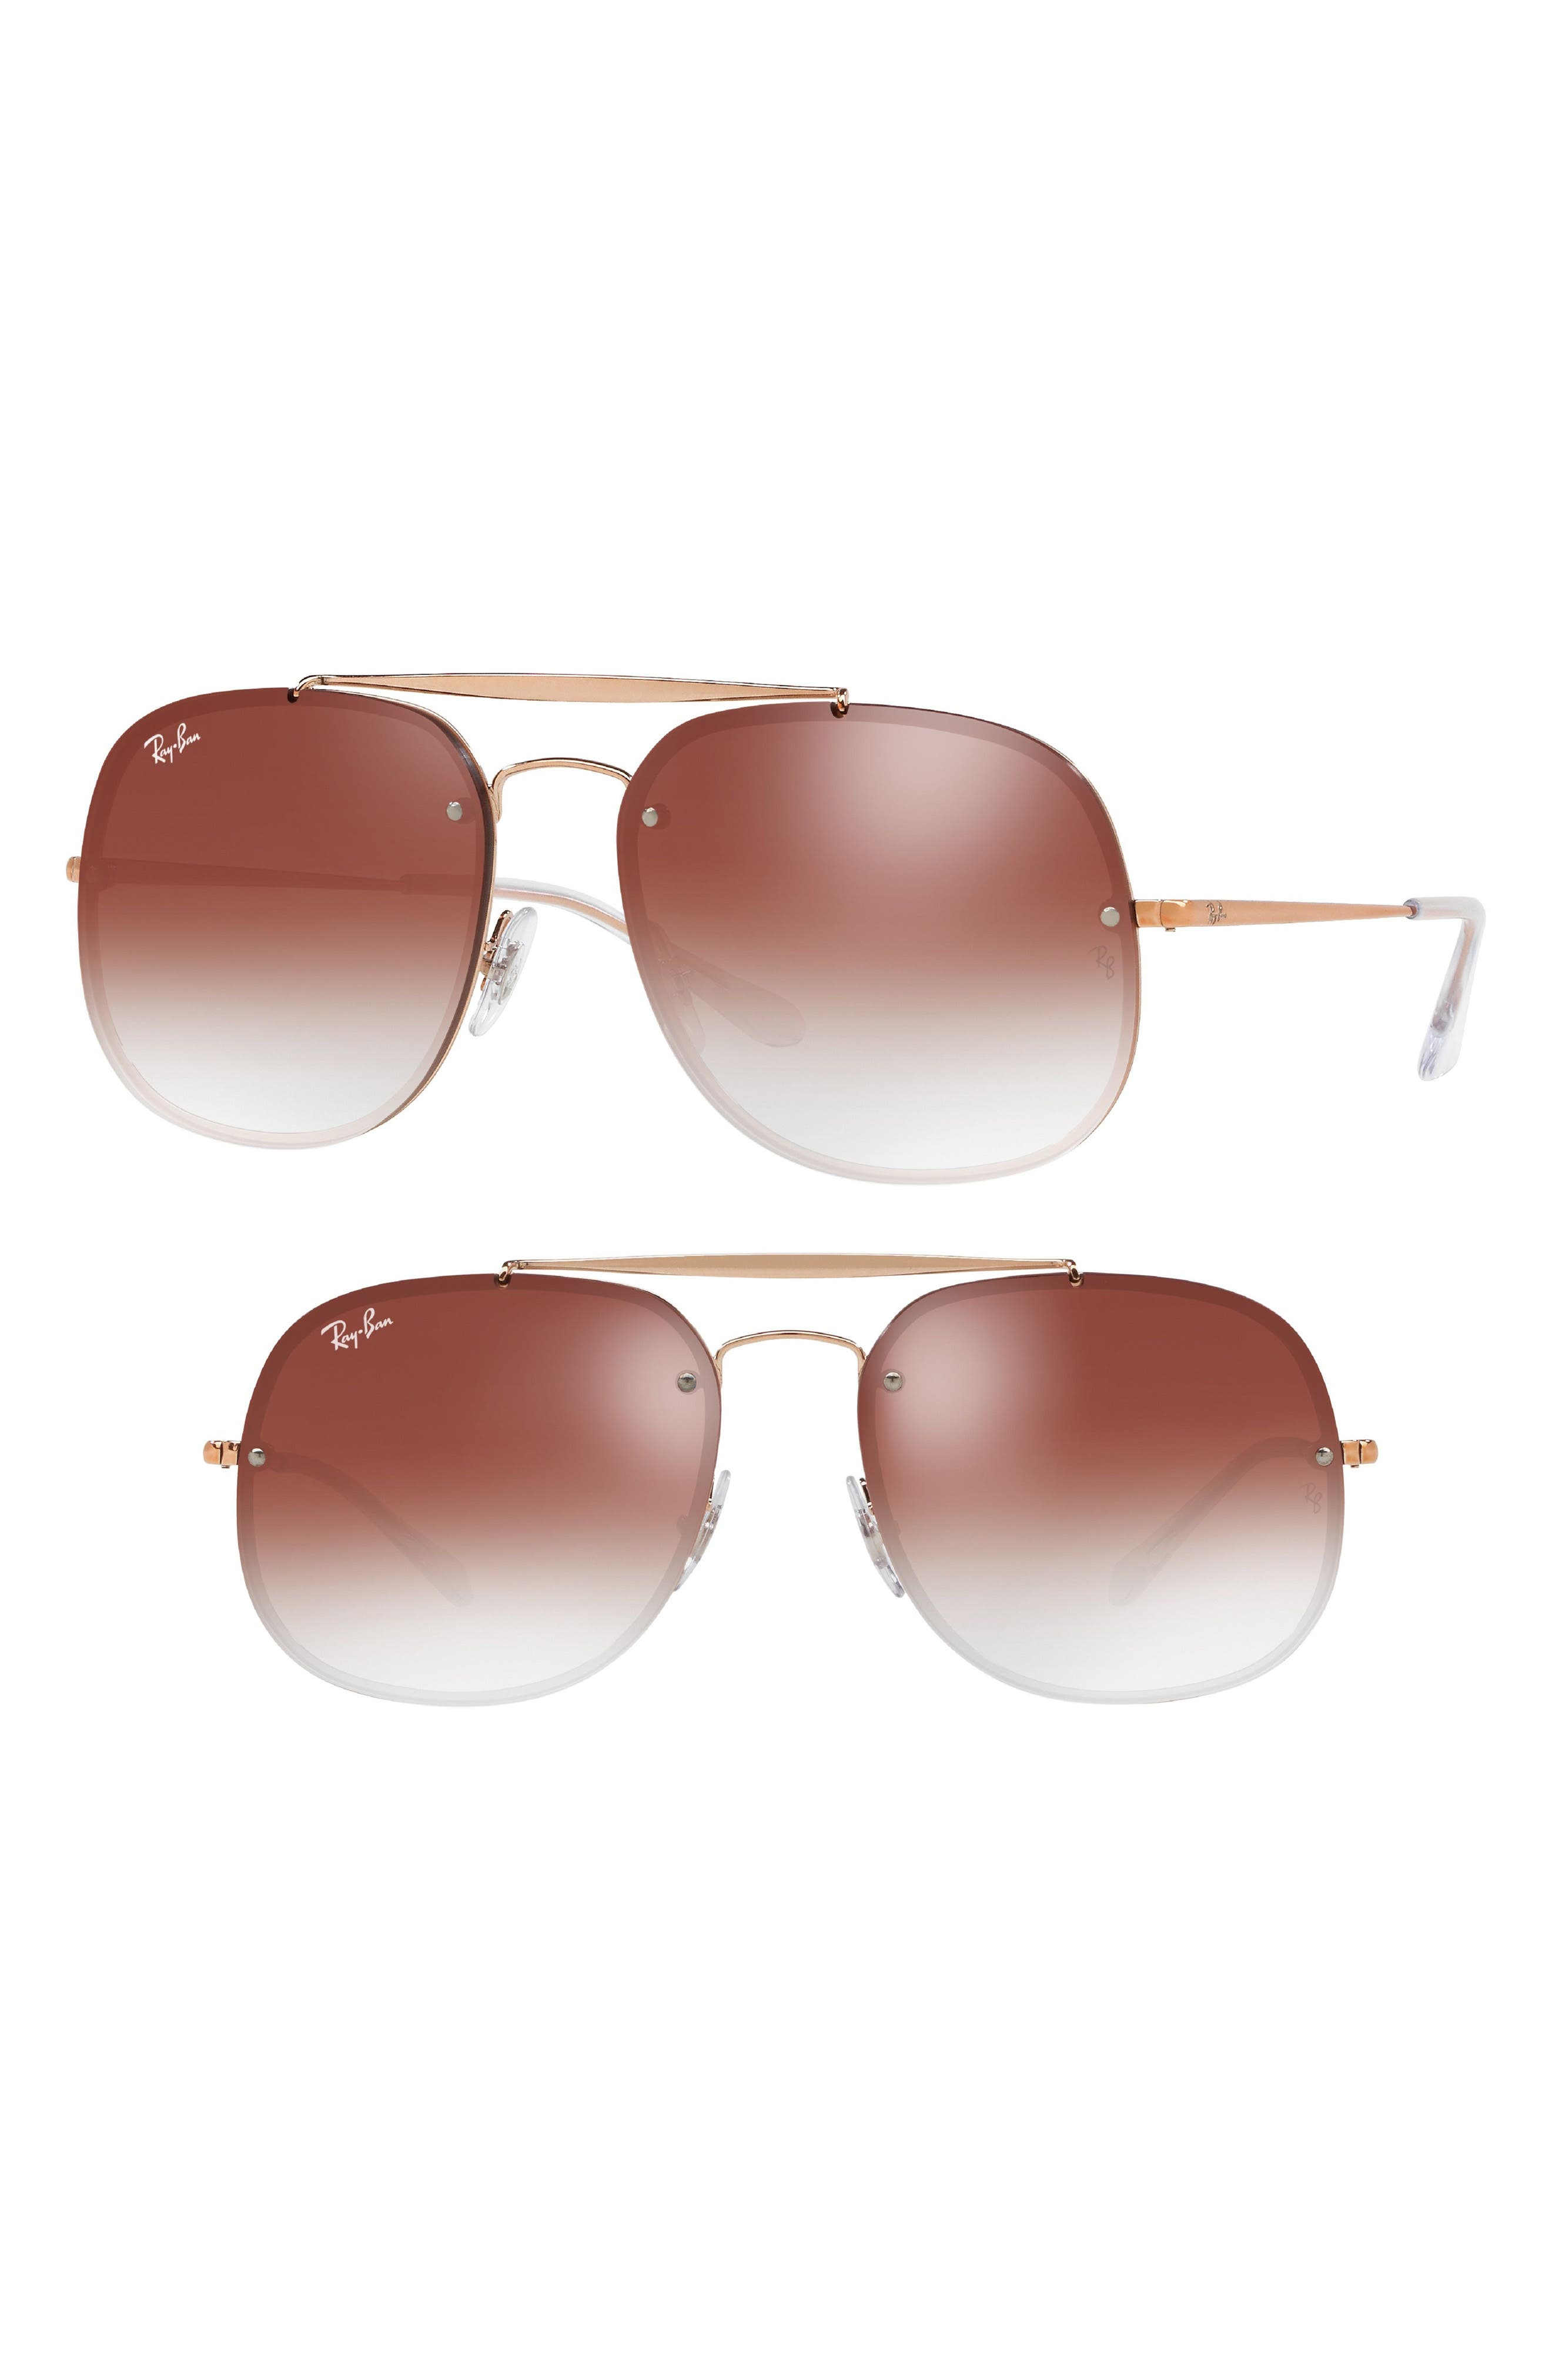 Blaze 58mm Gradient Lens Aviator Sunglasses,                             Main thumbnail 1, color,                             COPPER